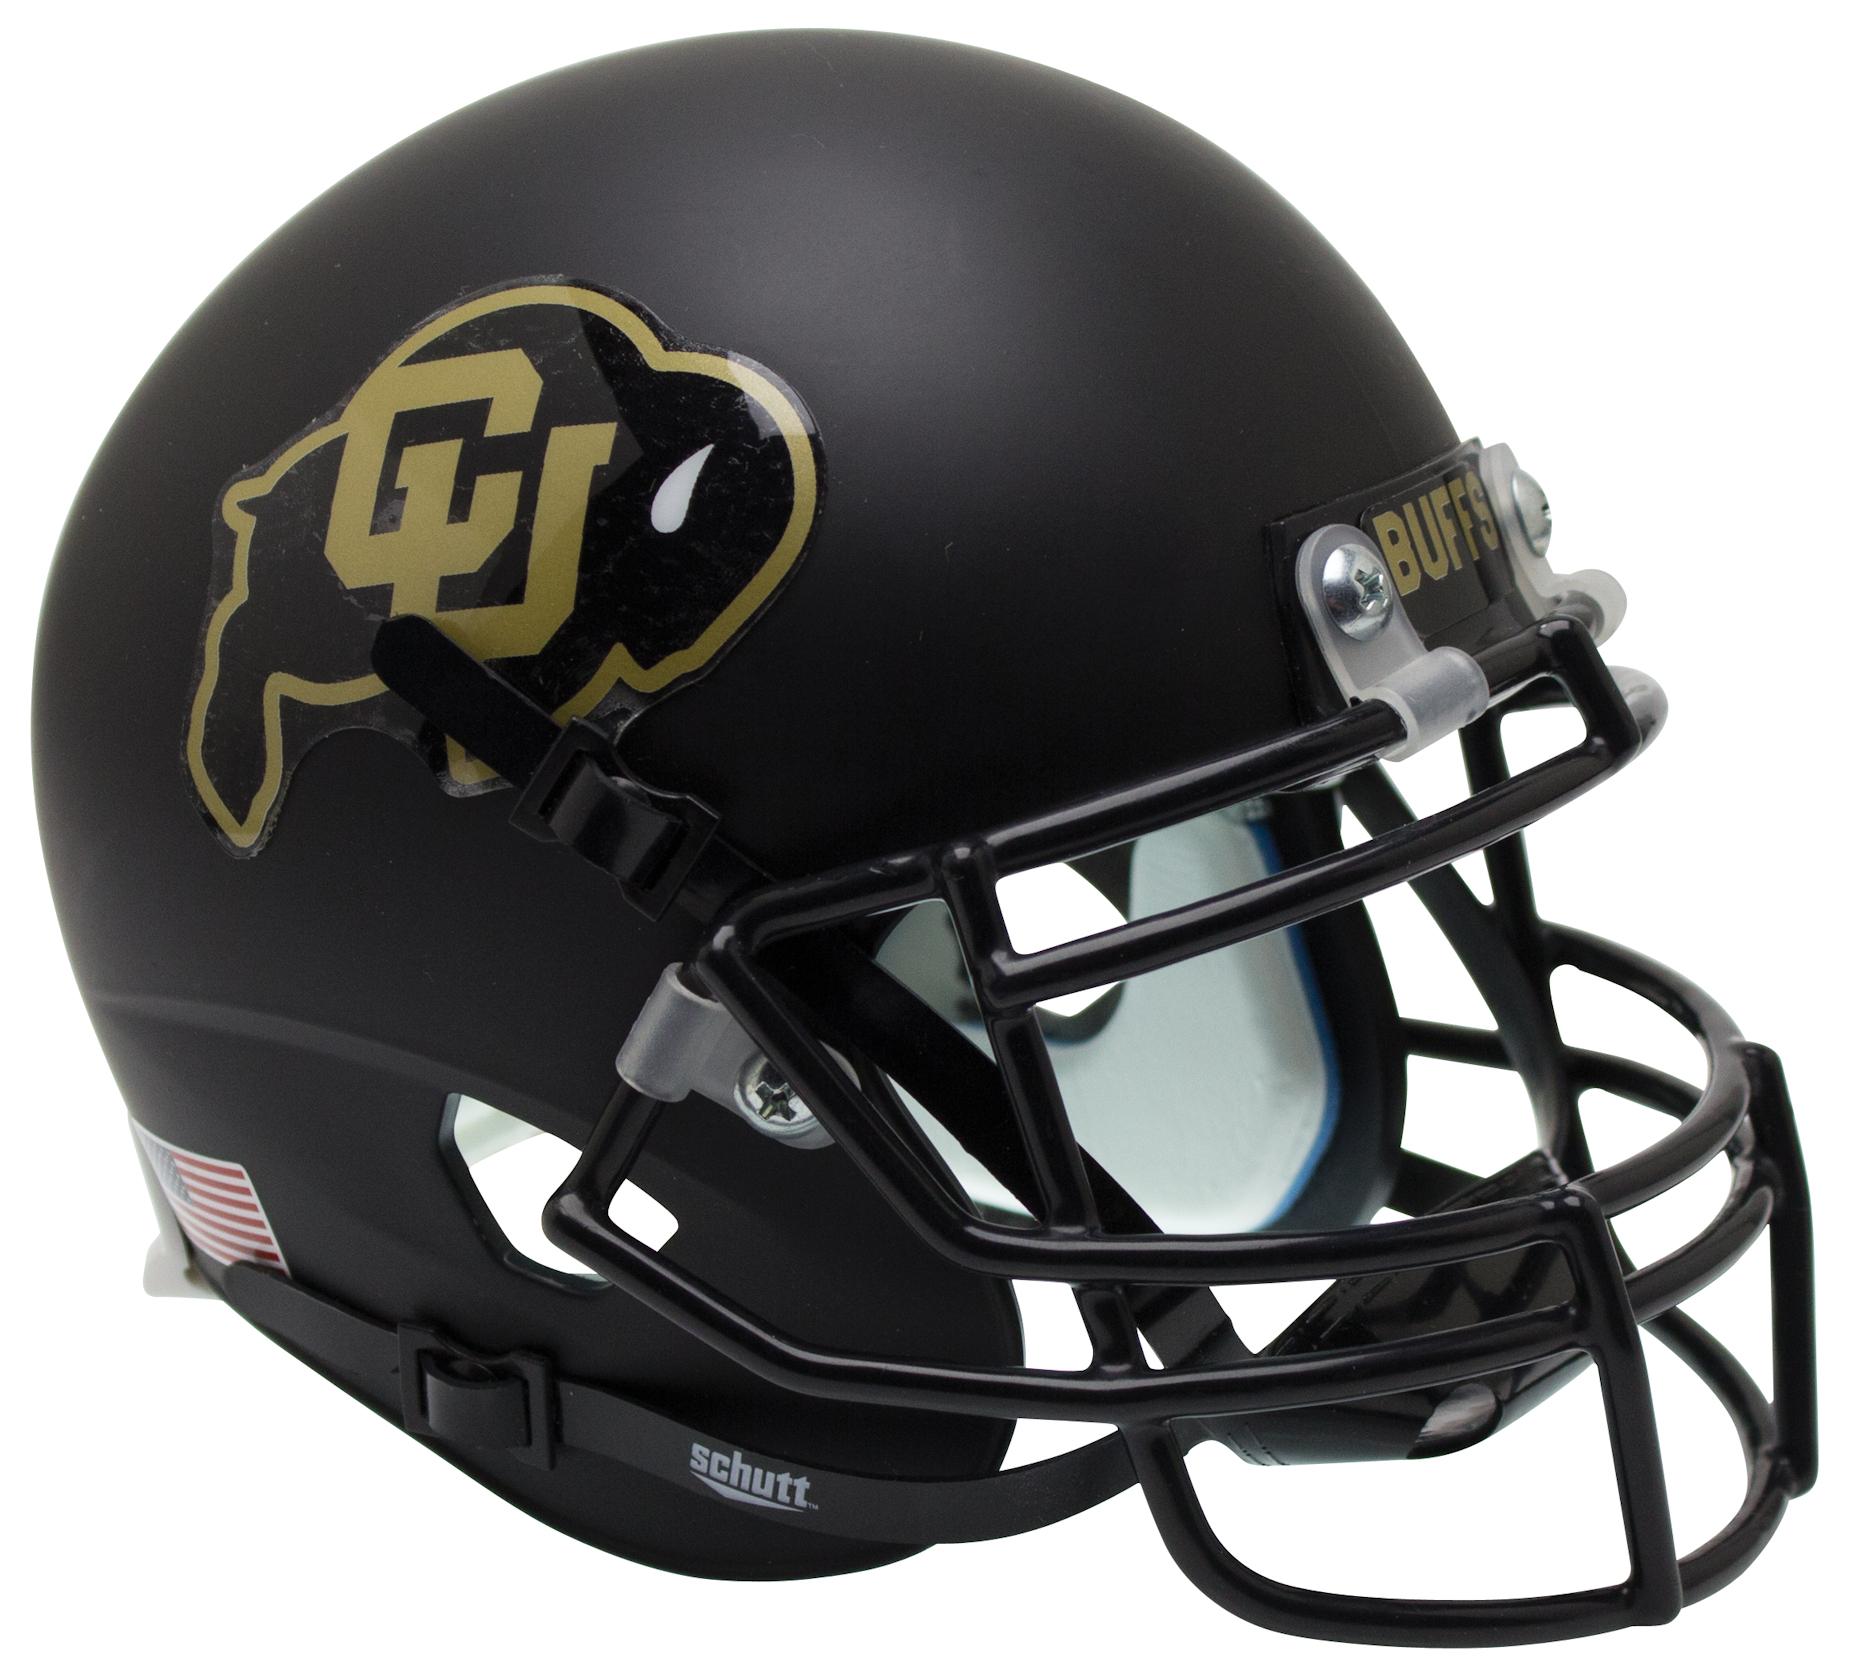 Colorado Buffaloes Authentic College XP Football Helmet Schutt <B>Black</B>